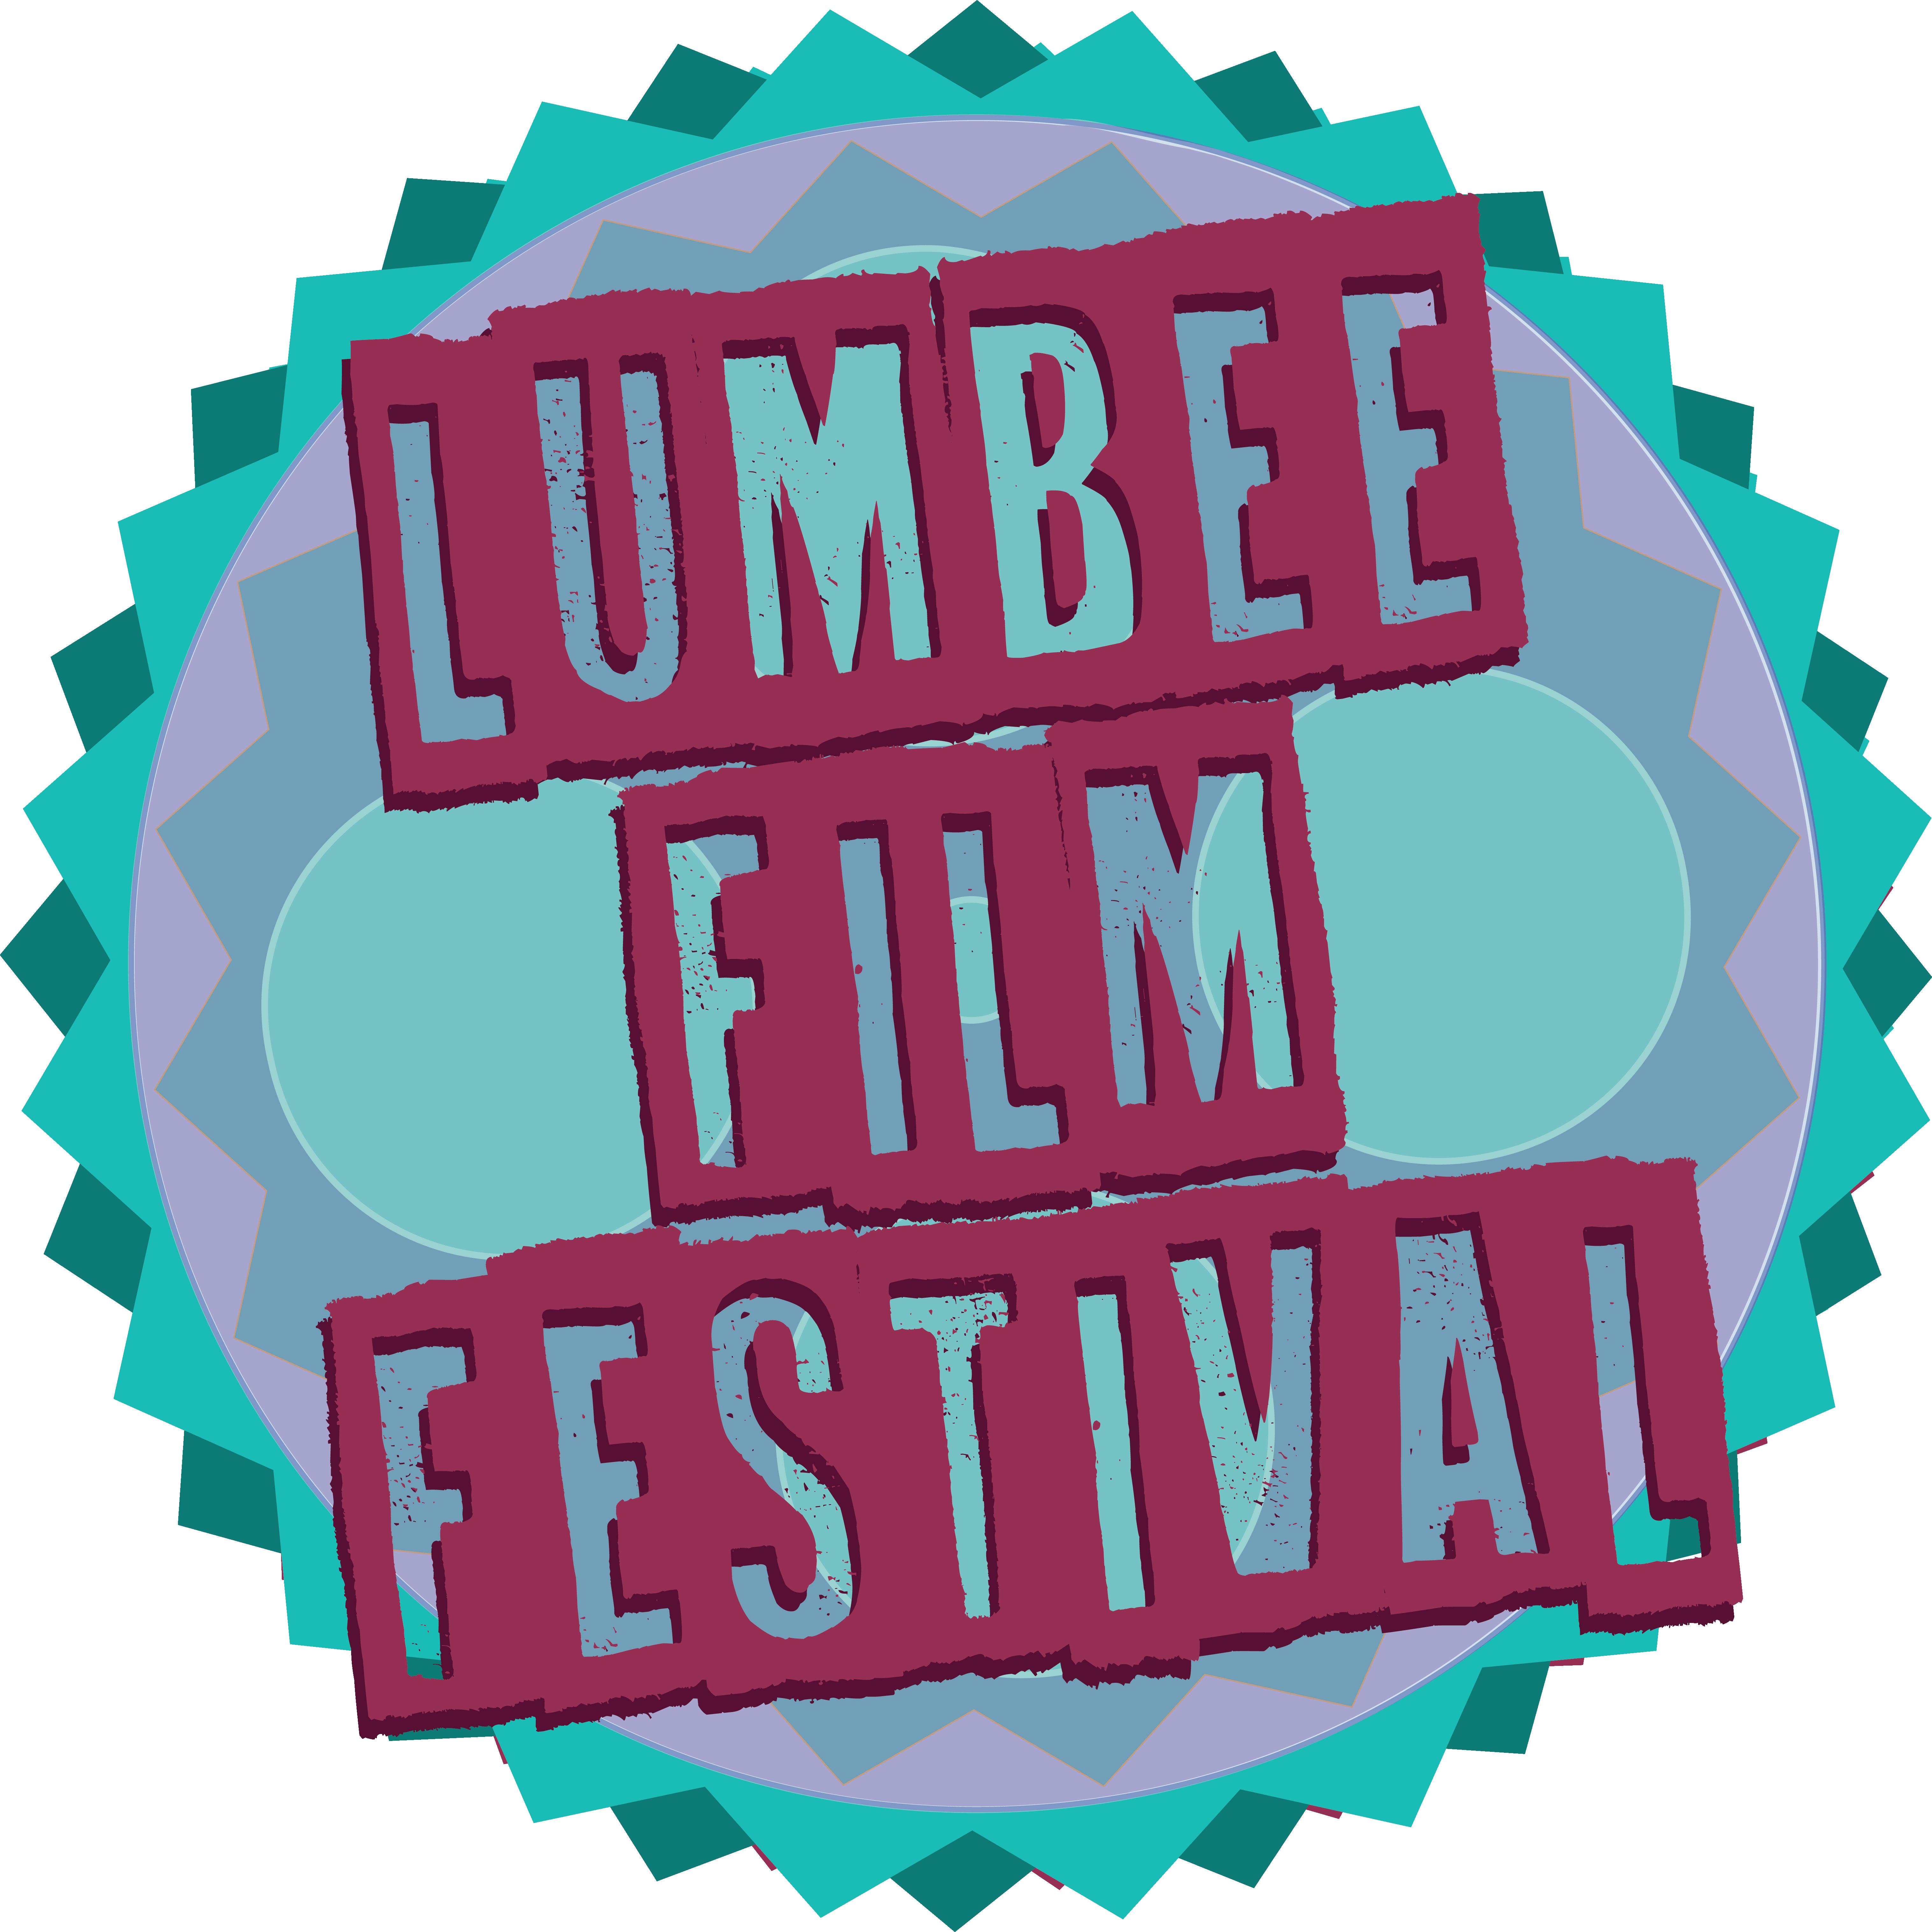 Lumbee Film Festival